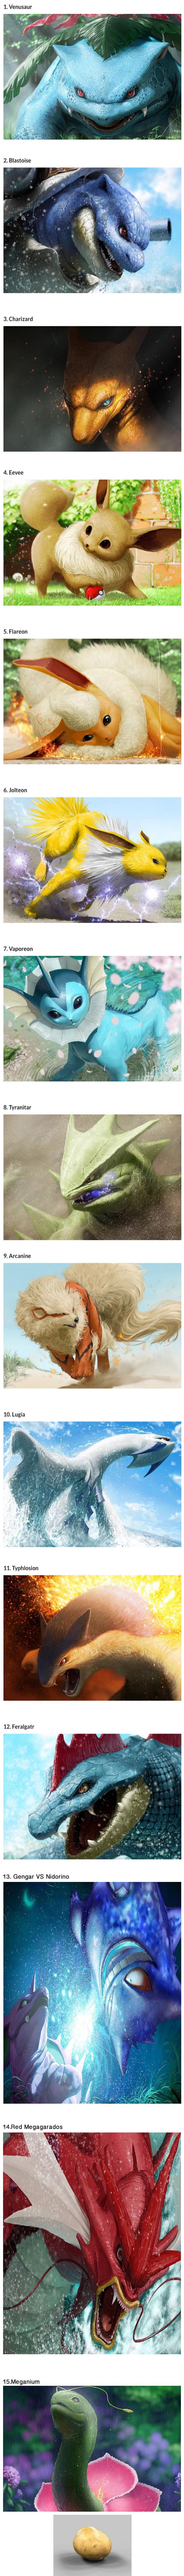 Japanese artist creates breathtaking realistic Pokemon paintings arts  Pokemon Japan Anime